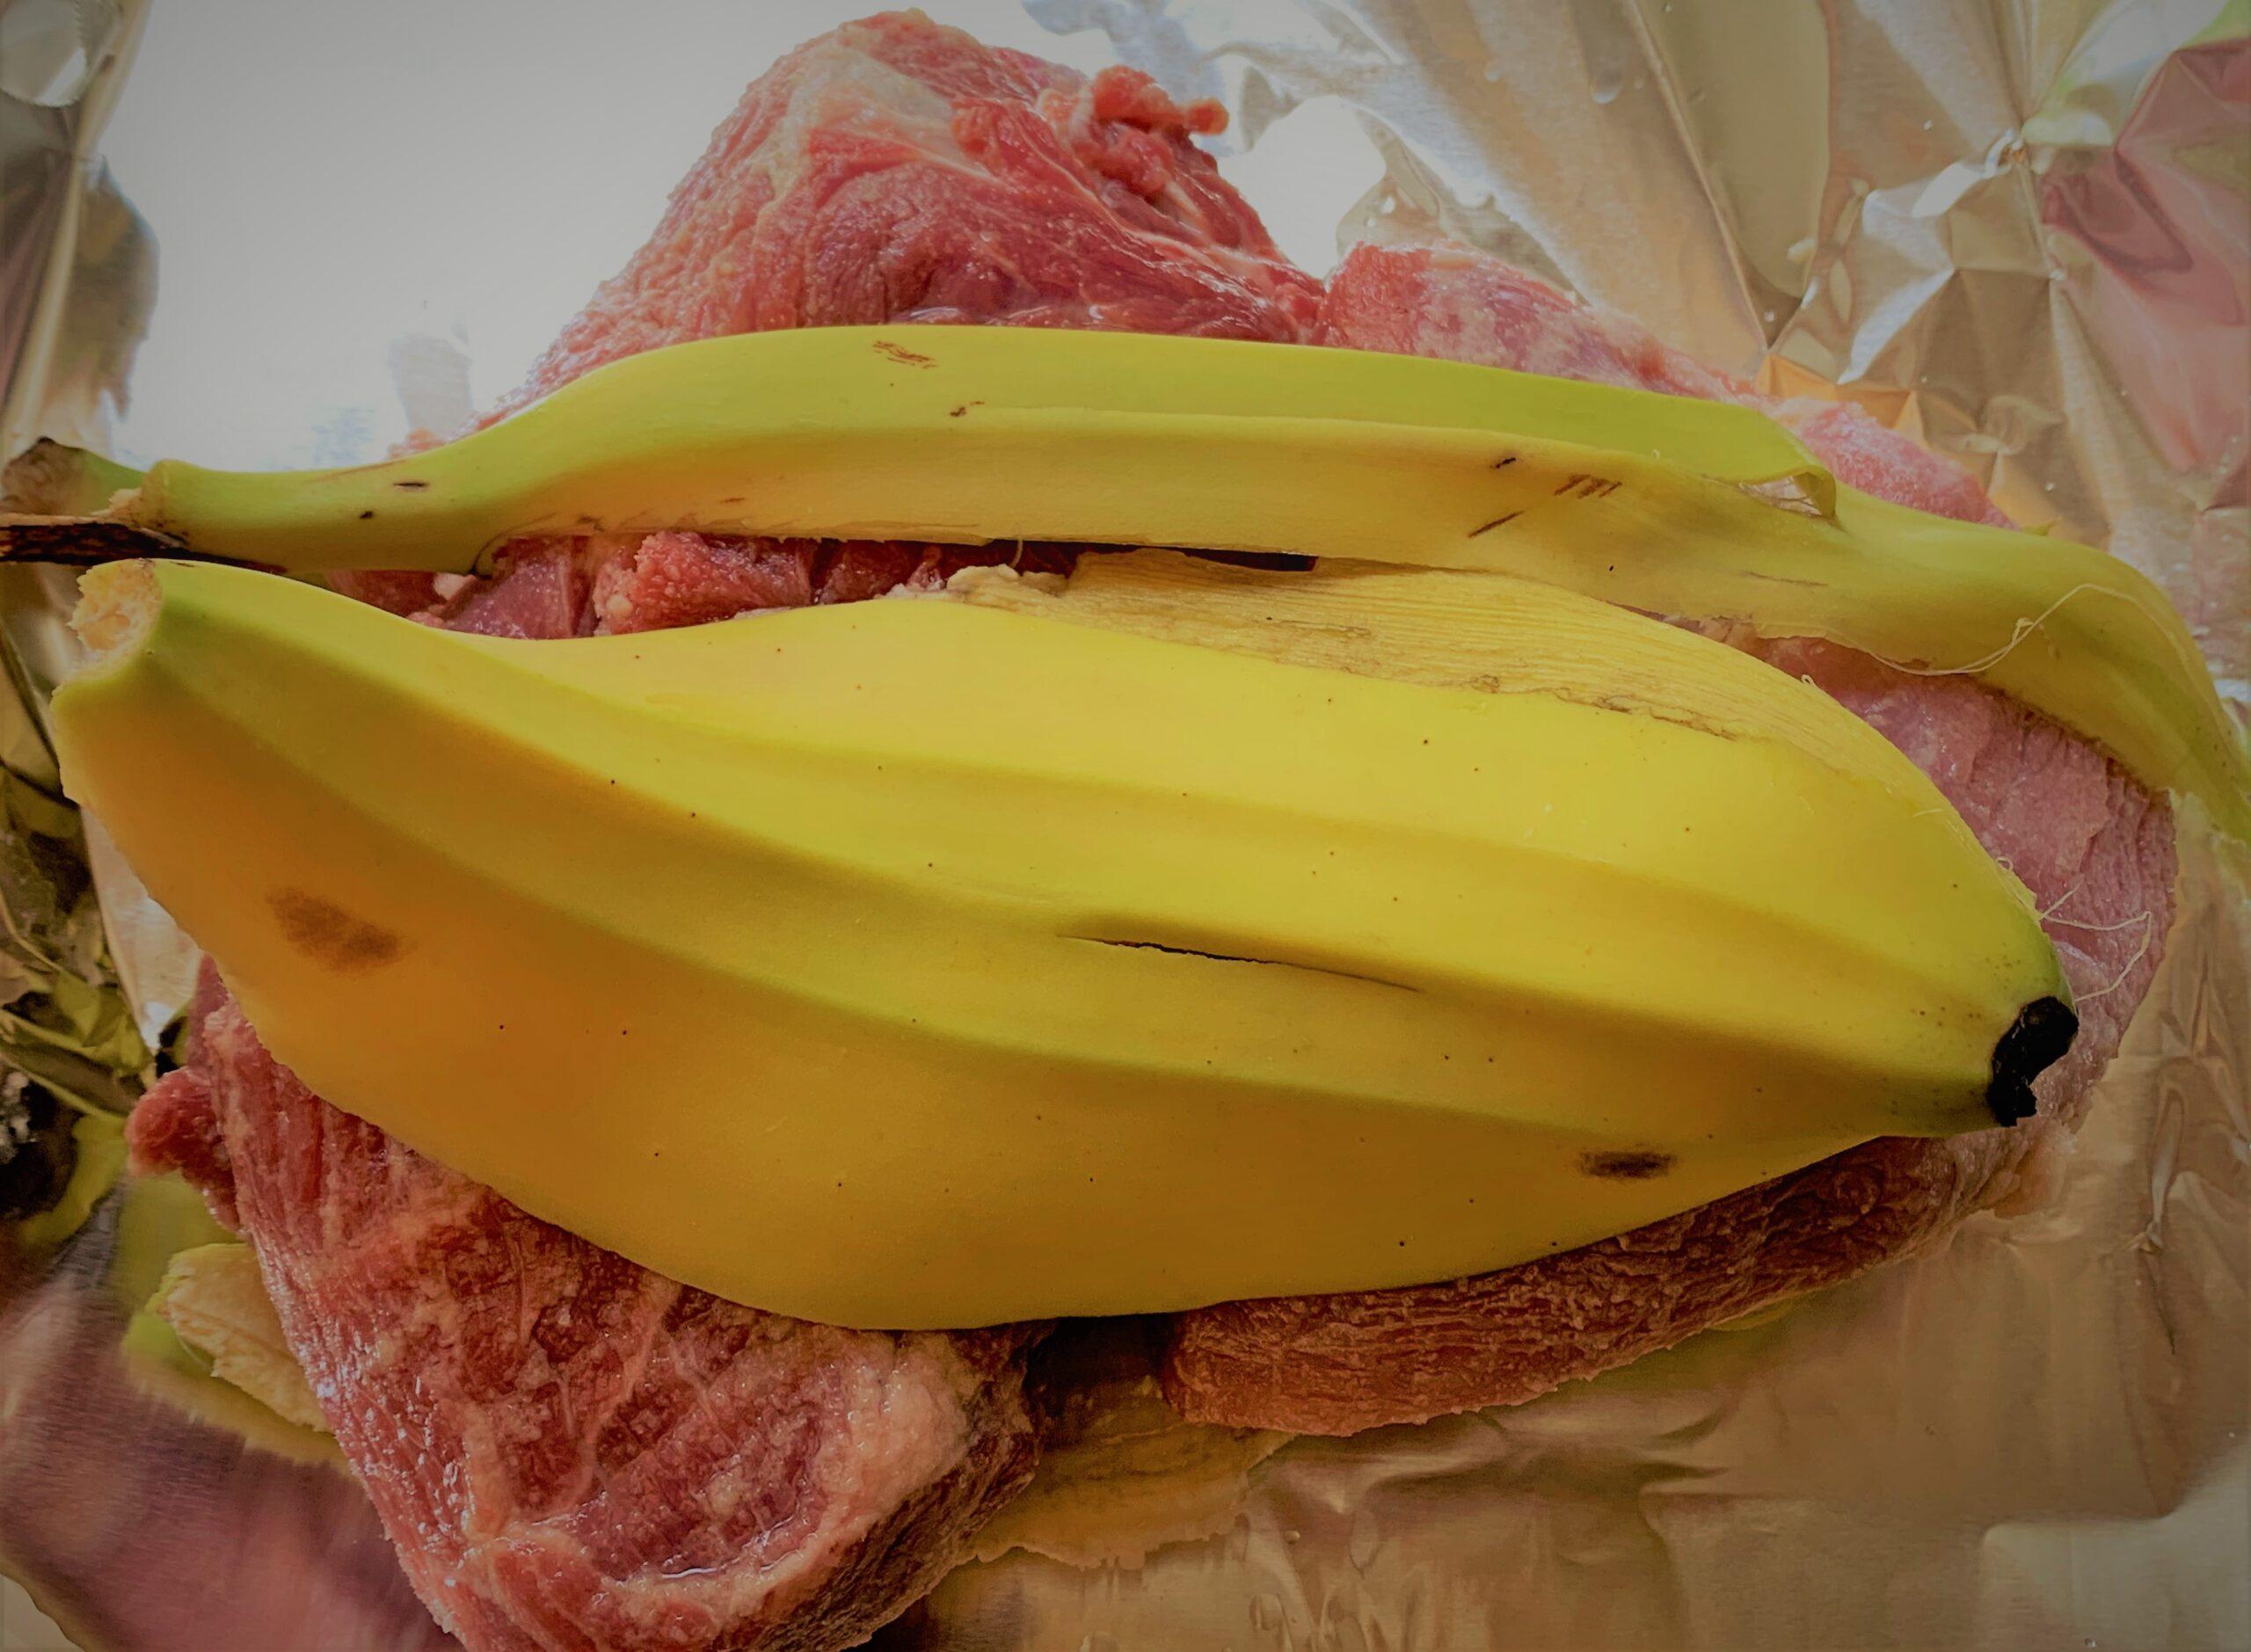 Banana Peel on top of the Pork Roast